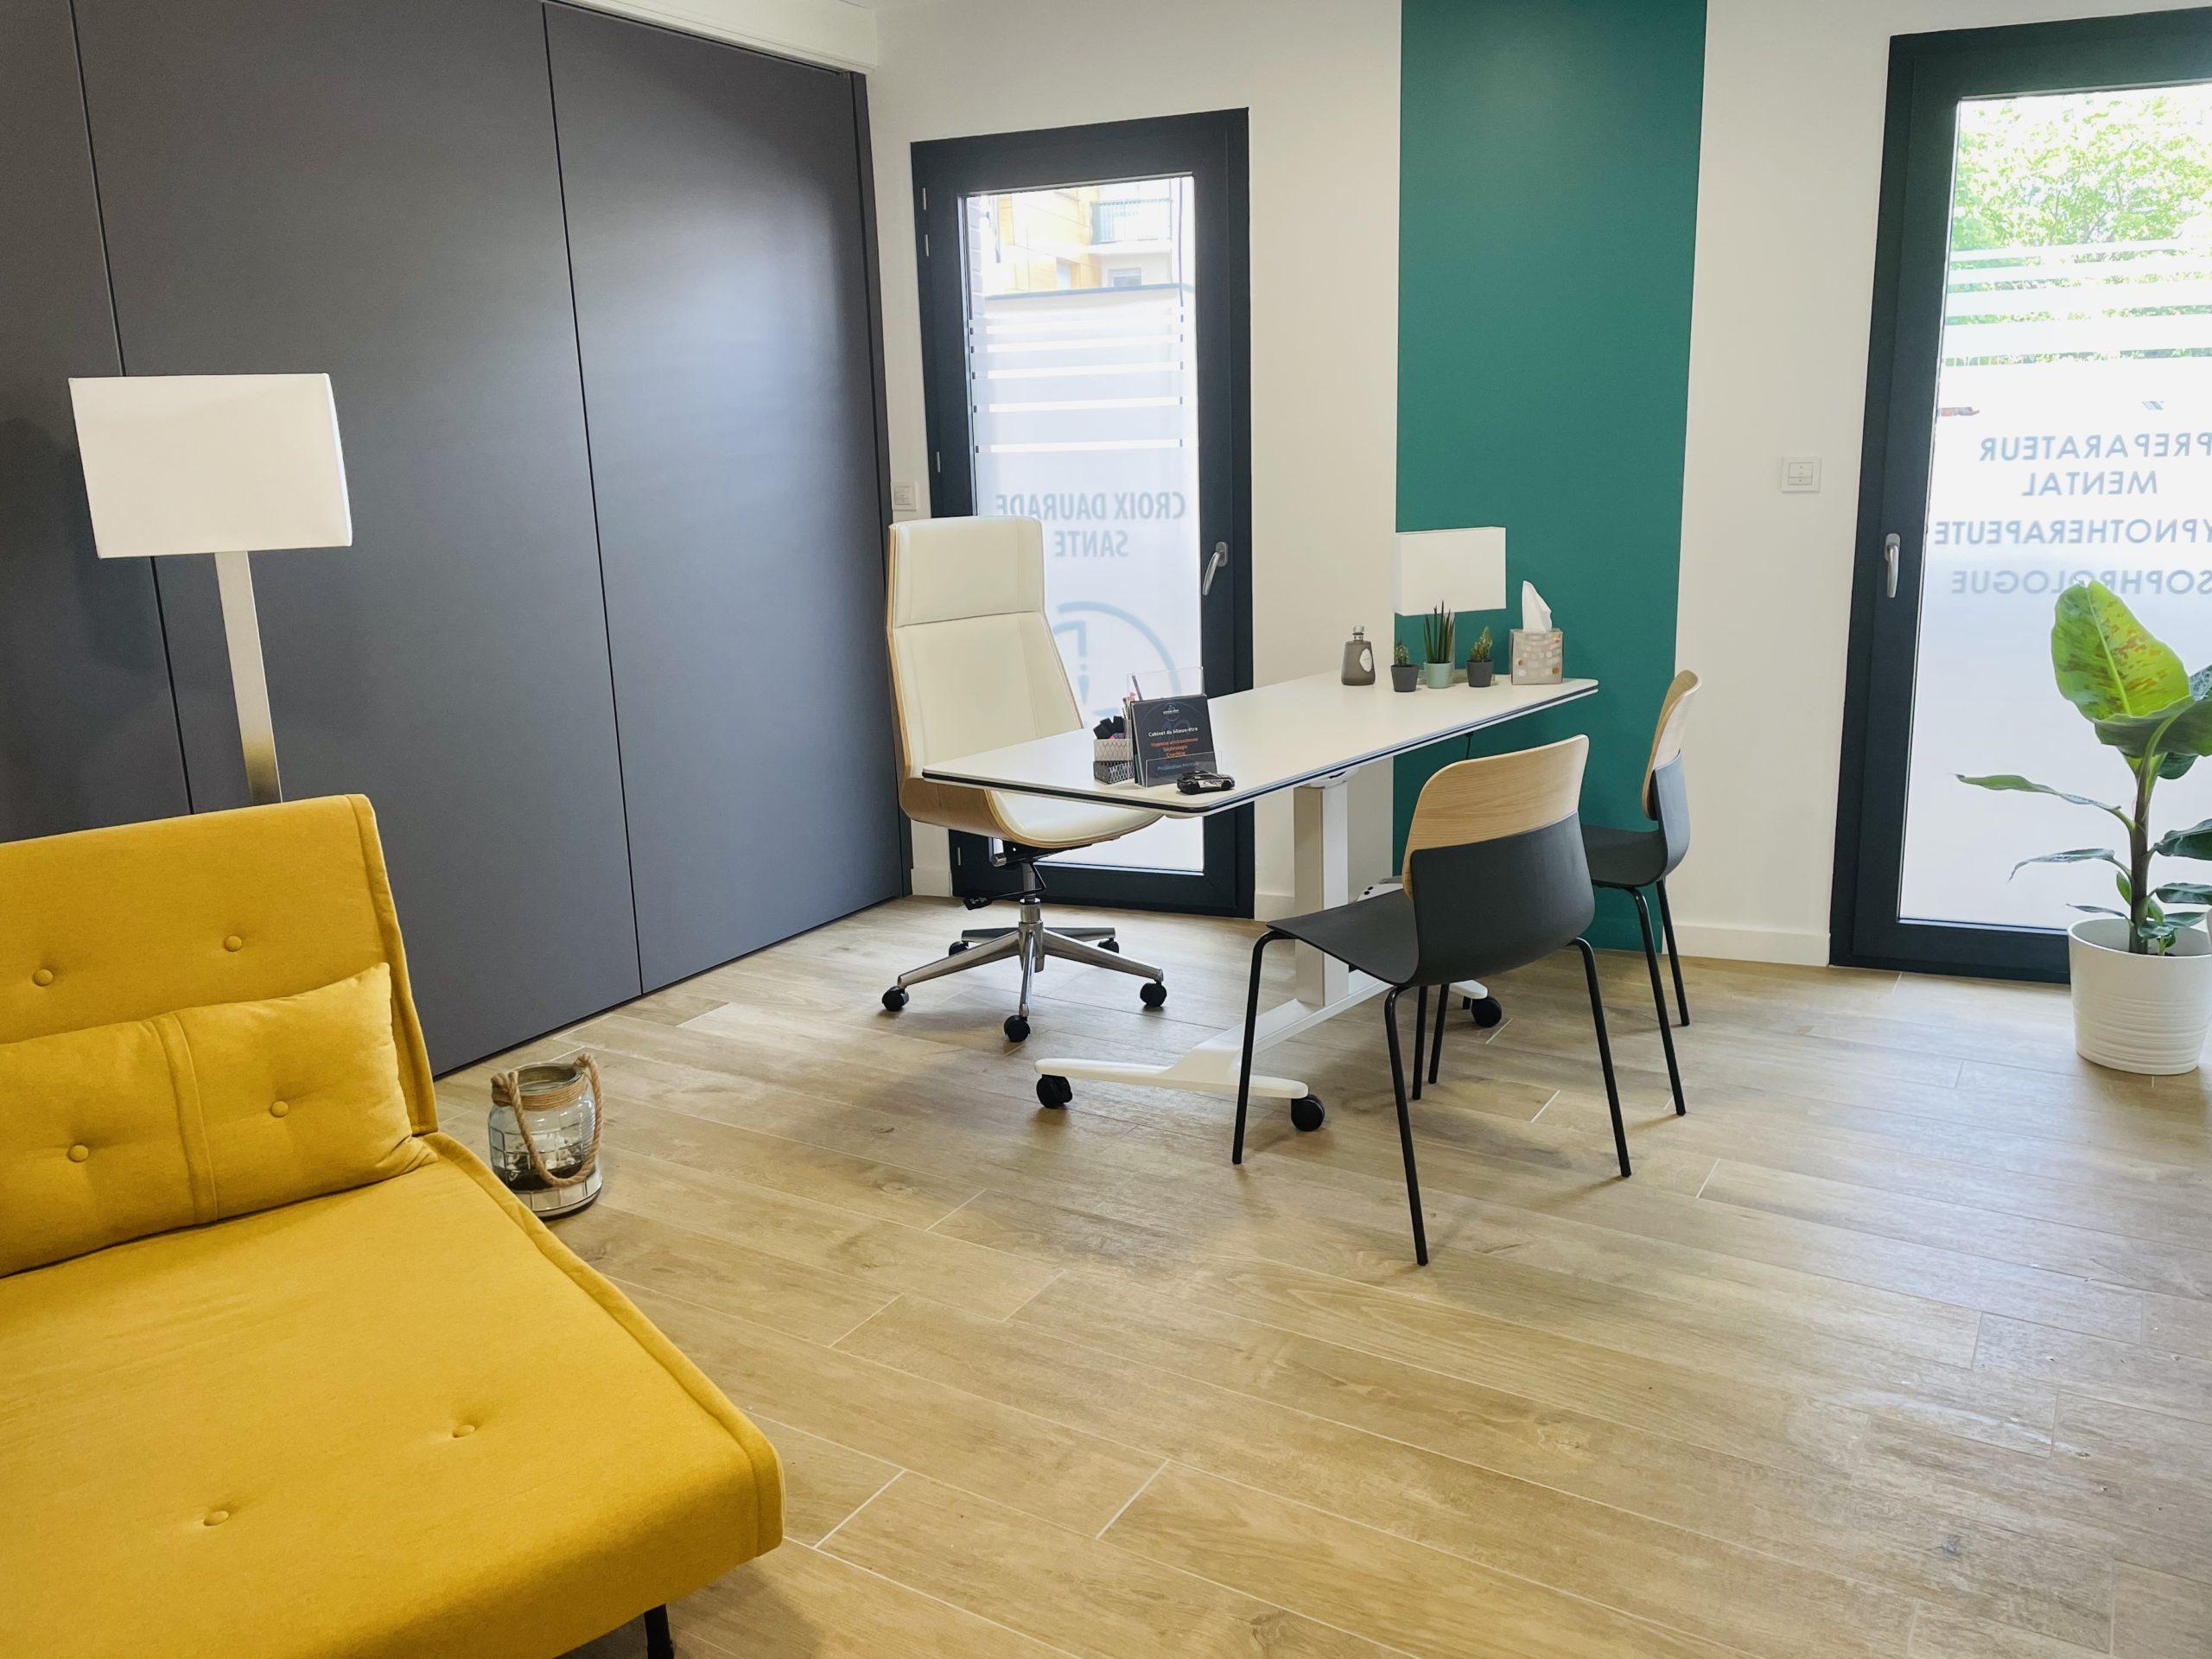 Le nouveau bureau de Croix-Daurade